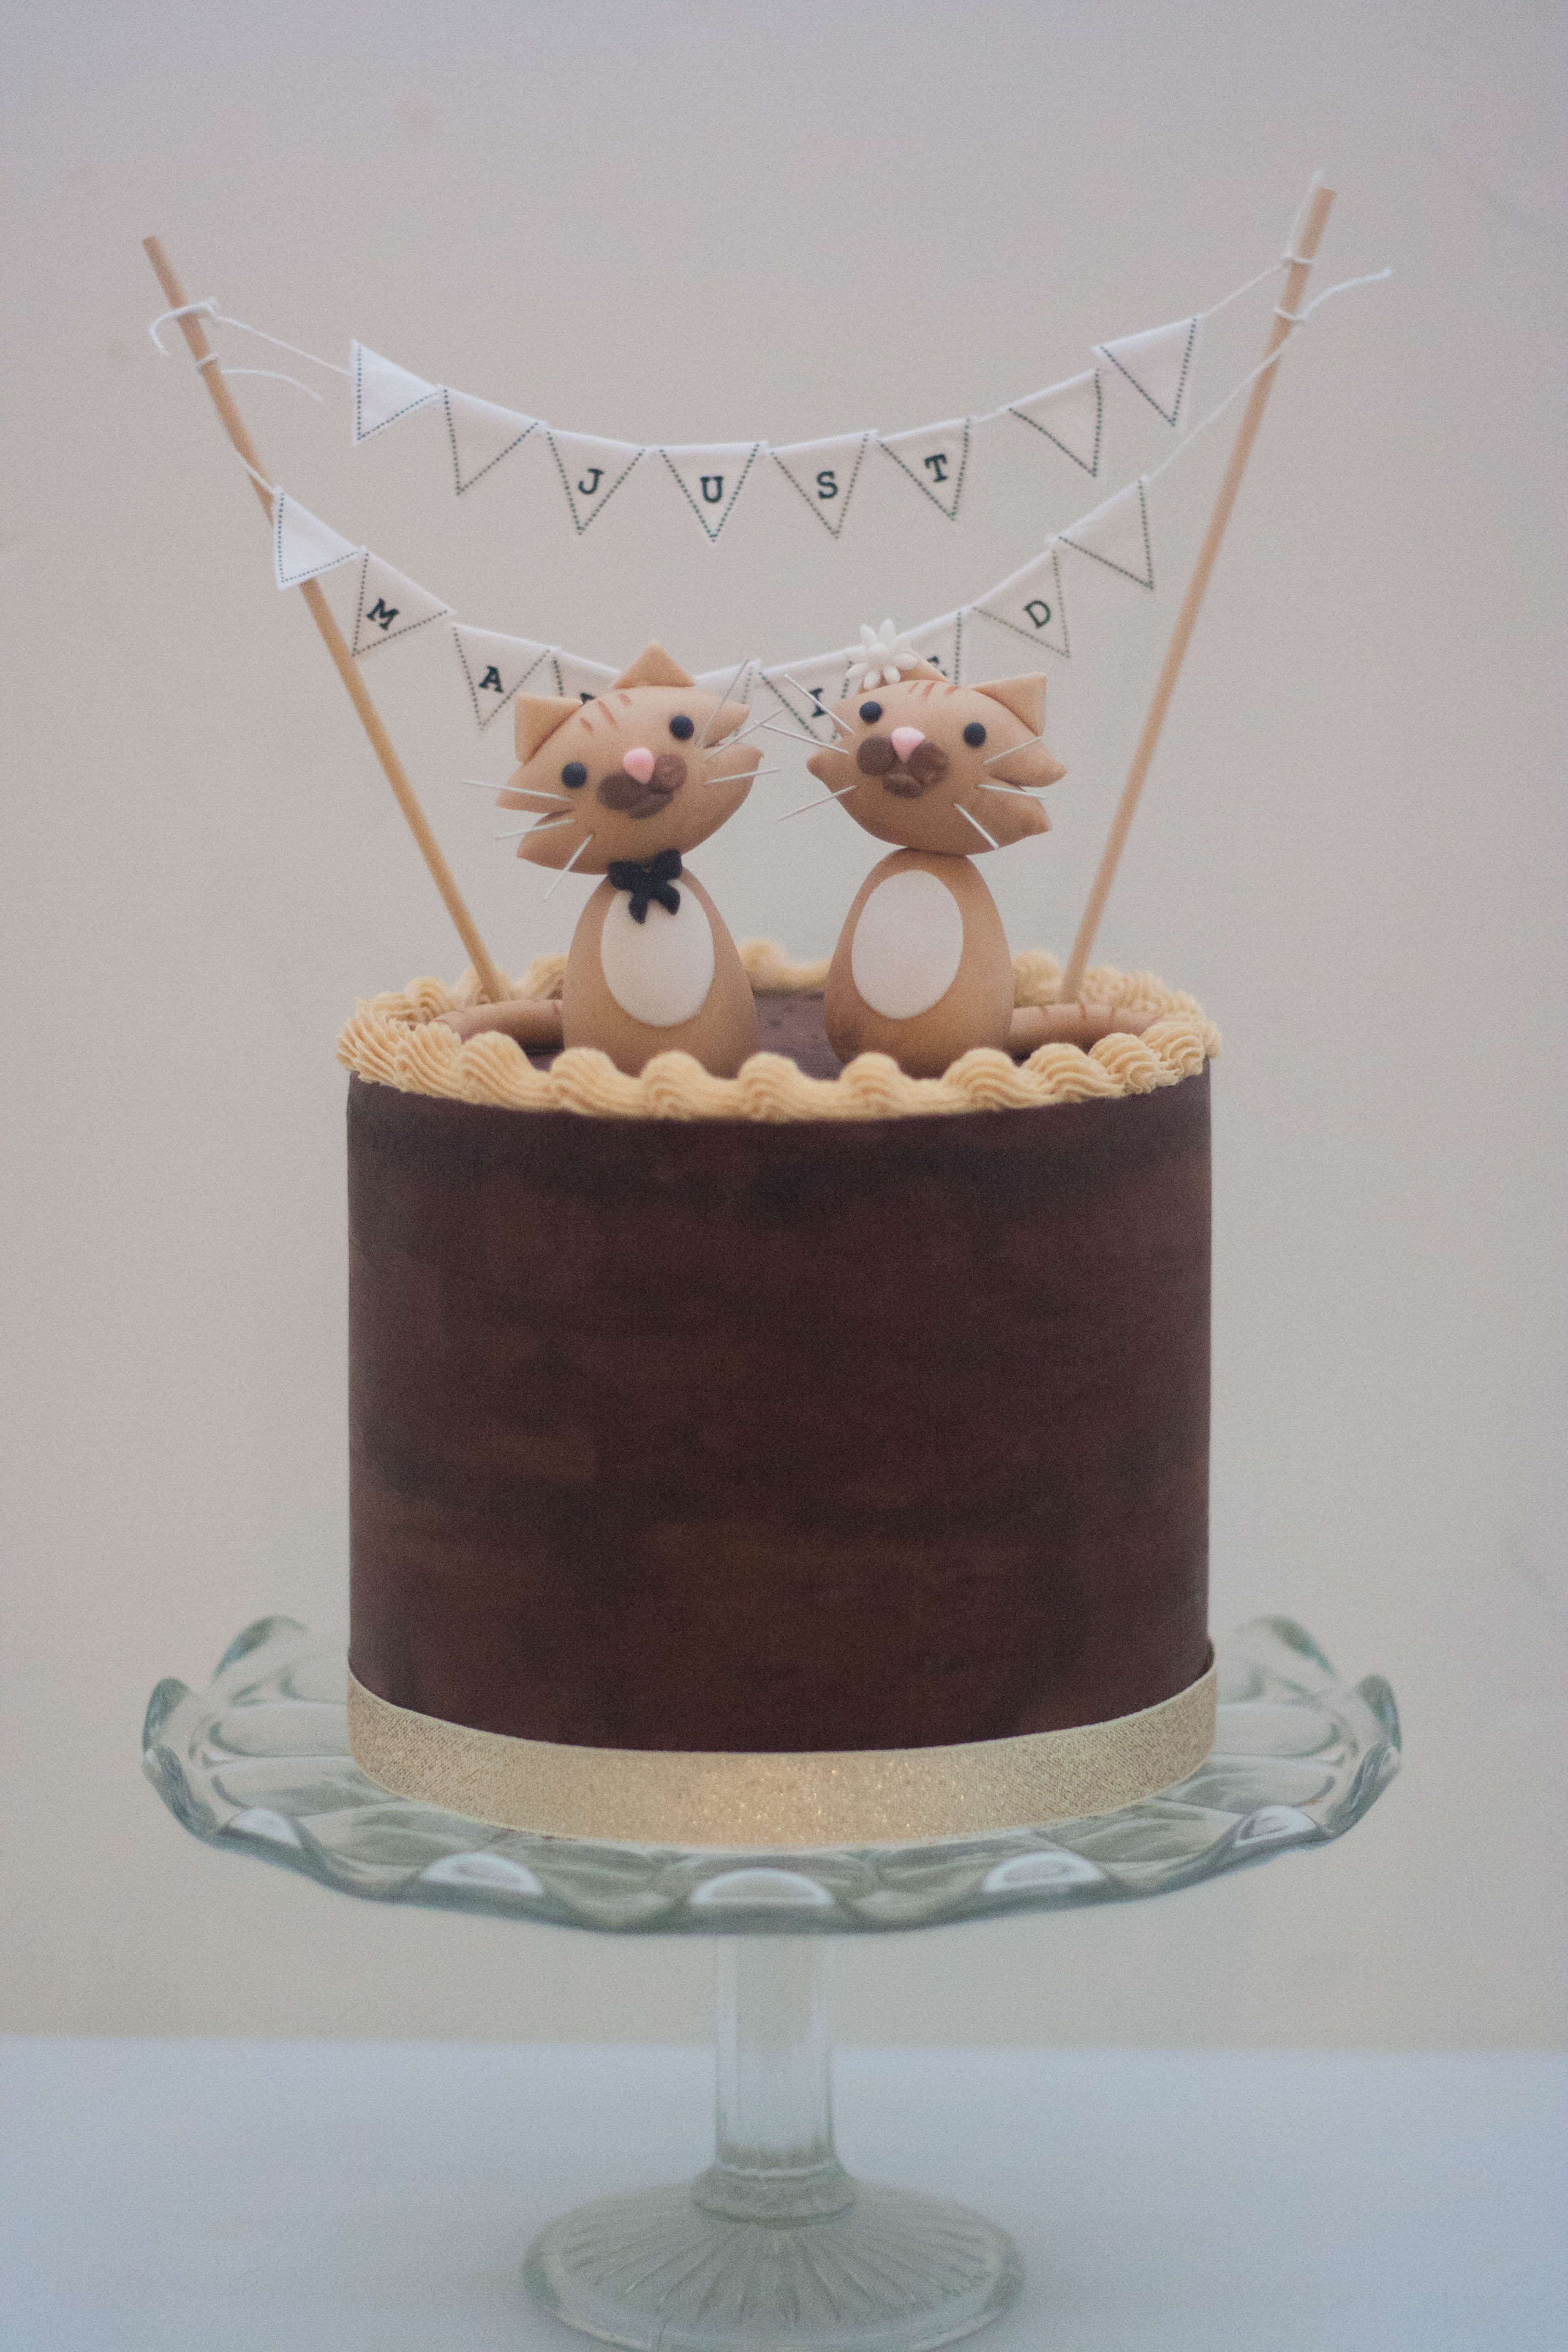 choc peanut ganache vegan wedding cake c